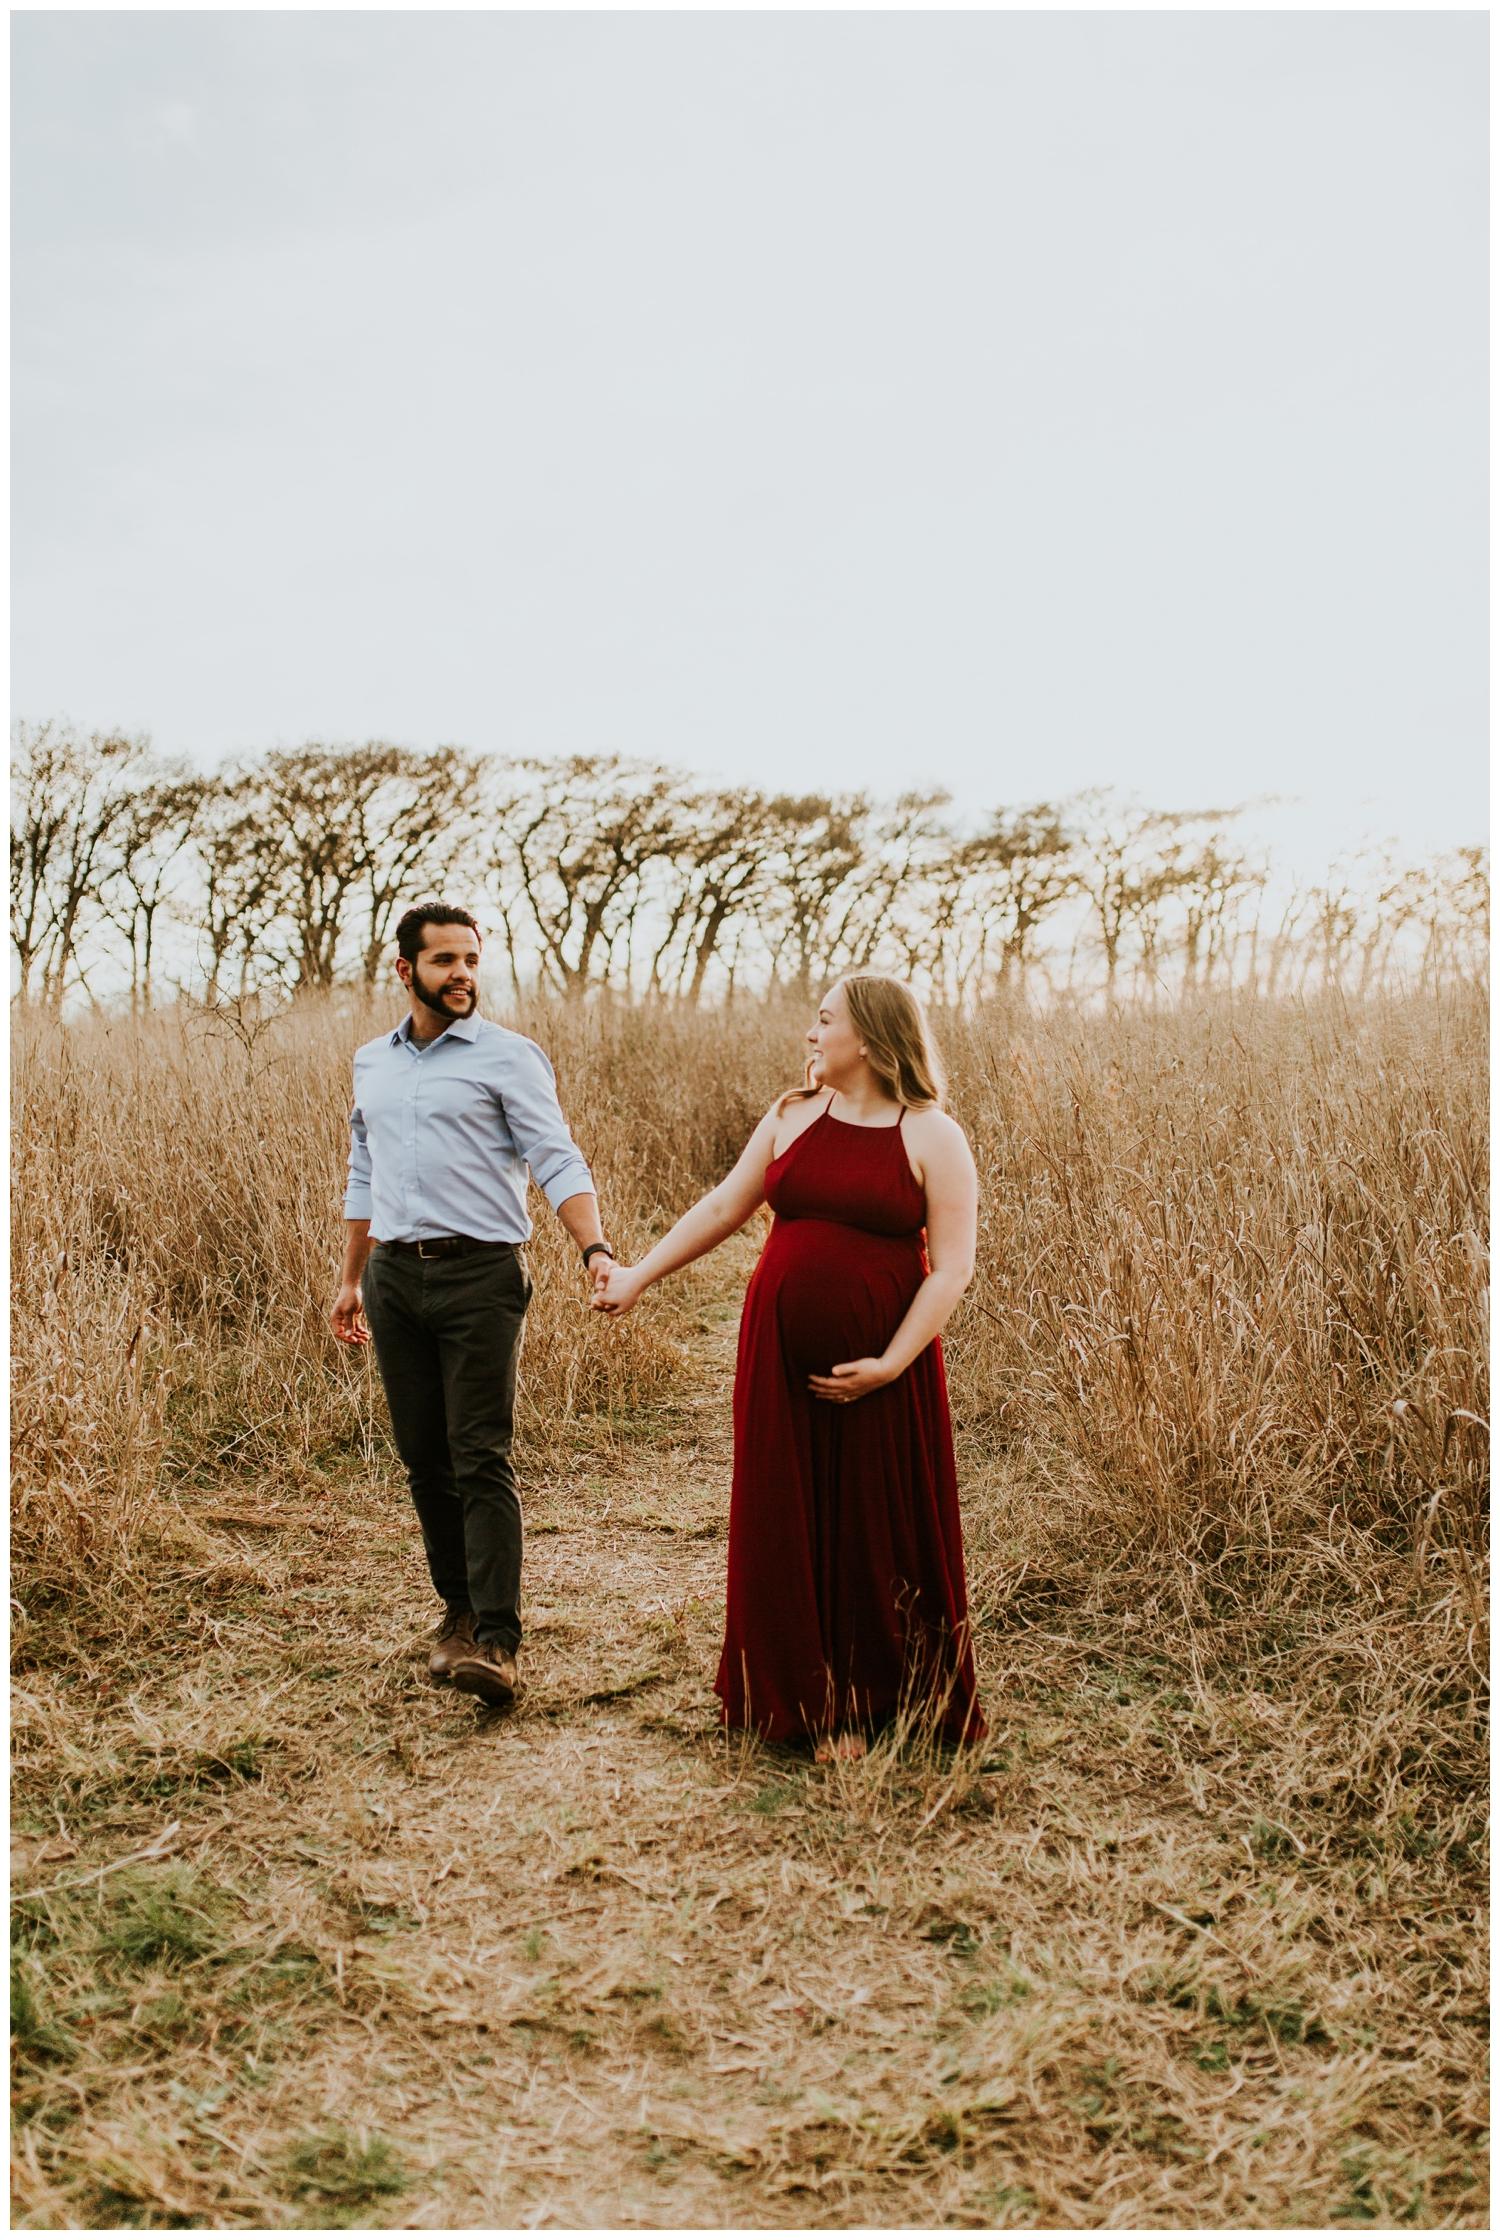 Haley+Jonathon, Maternity Session, San Antonio, Contista Productions Photography_0030.jpg